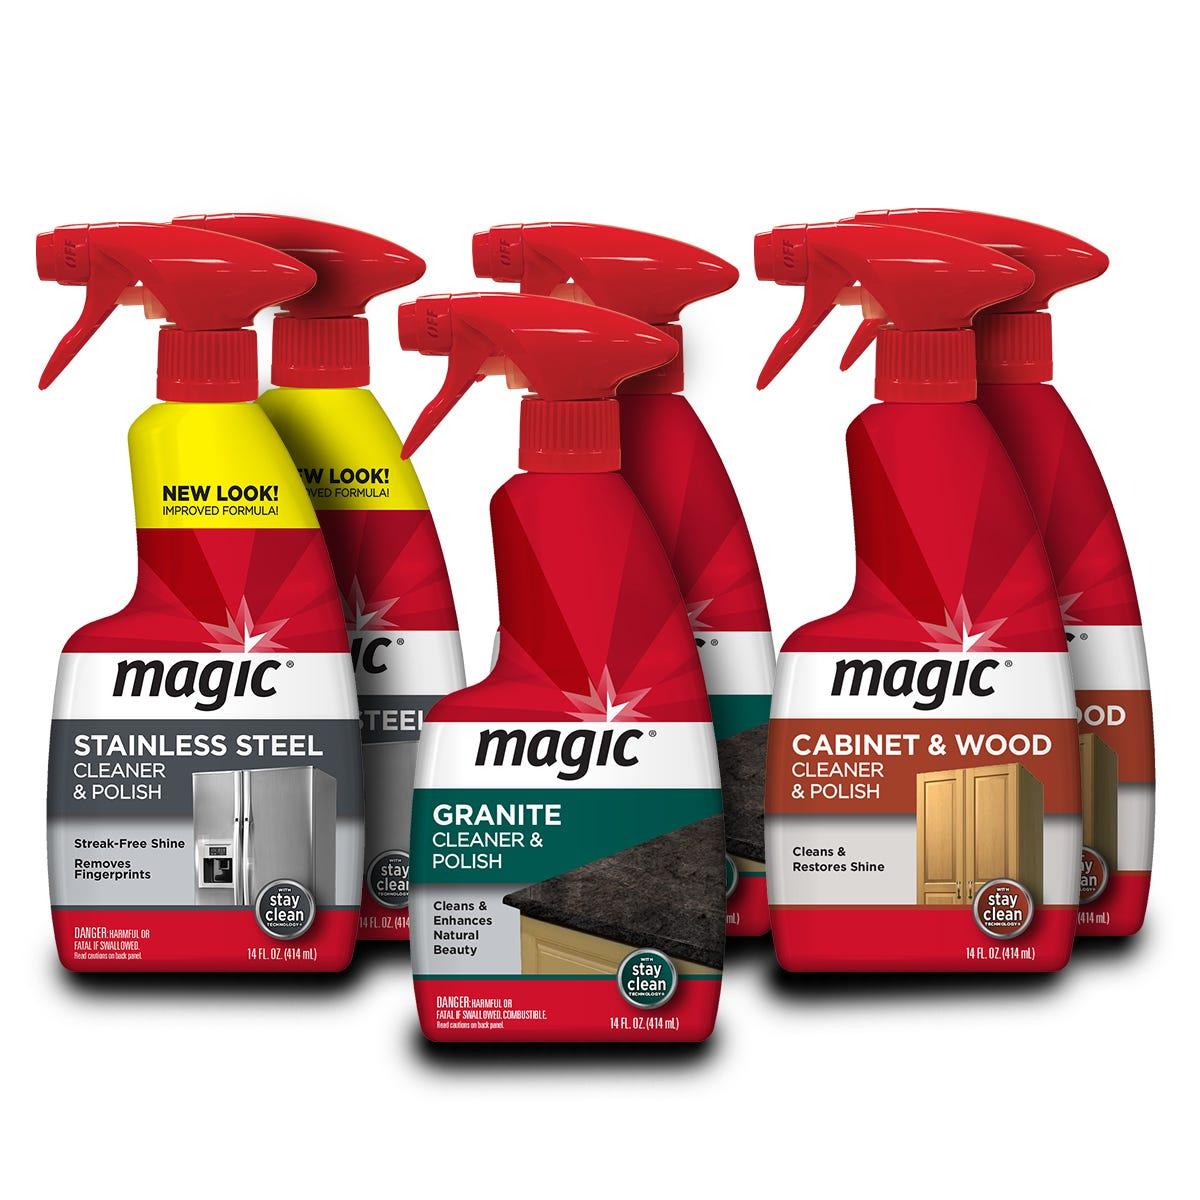 https://googone.com/media/catalog/product/m/a/magic_kitchen_clean_up_kit_1.jpg